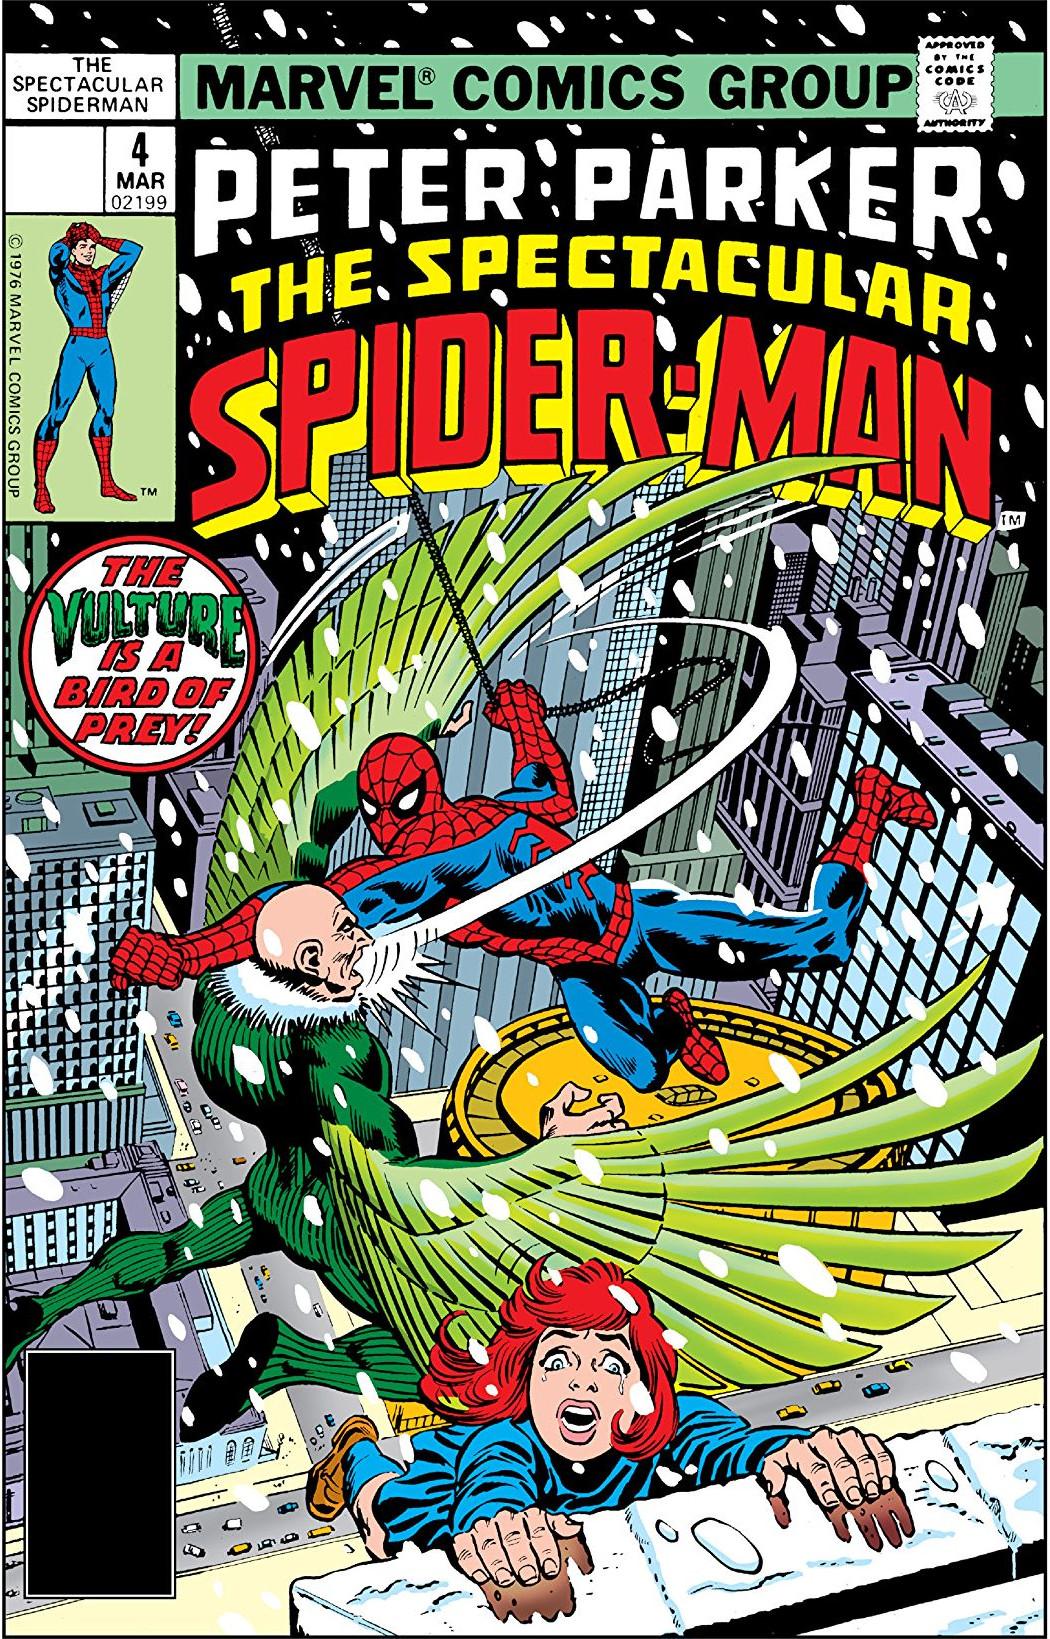 Peter Parker, The Spectacular Spider-Man Vol 1 4